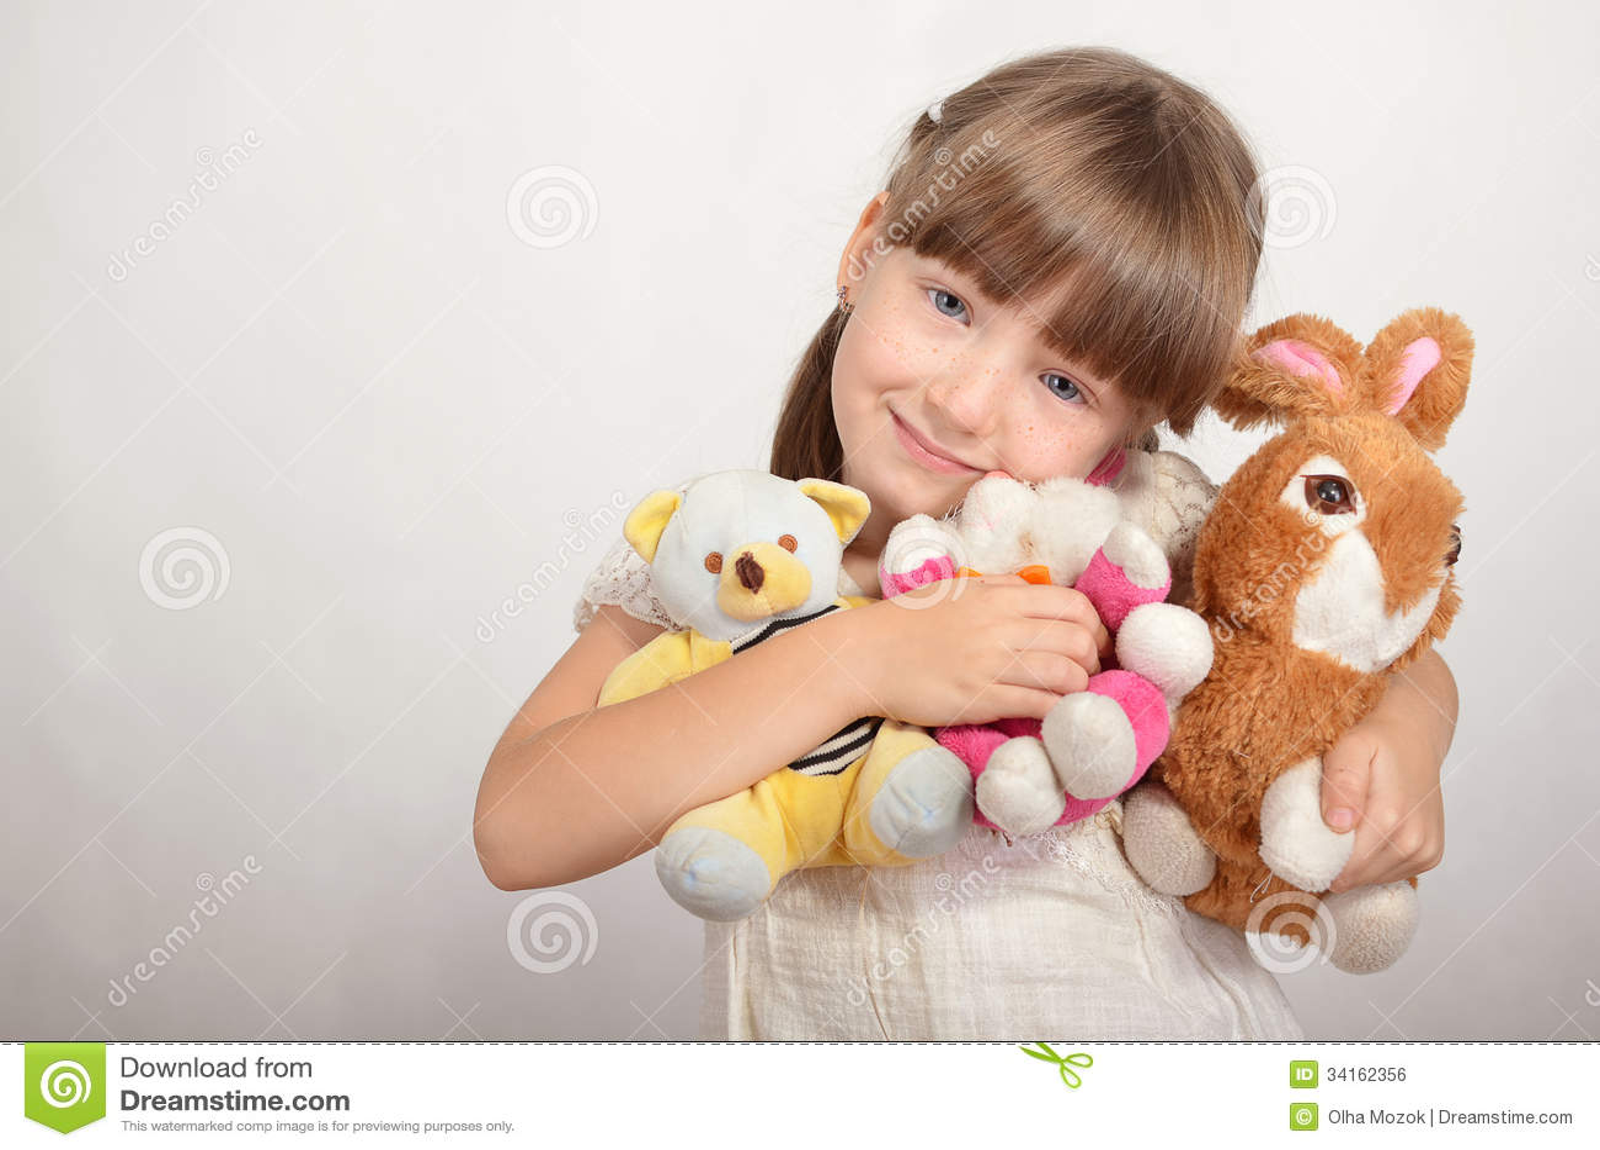 девочка с игрушками